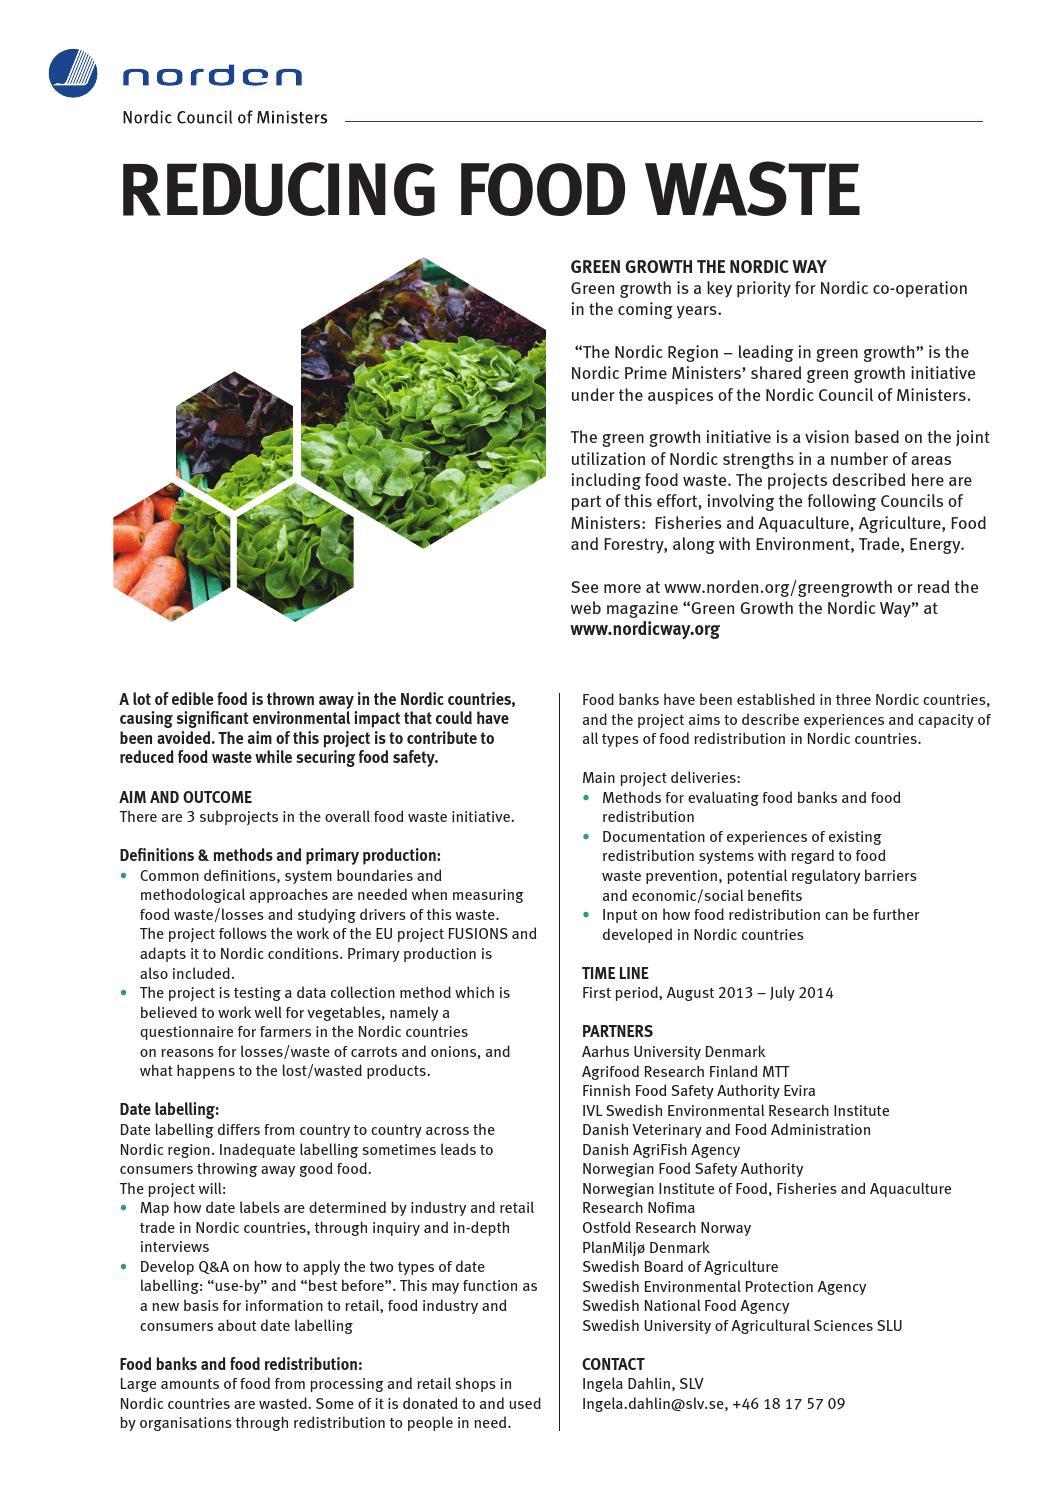 REDUCING FOOD WASTE by Nordisk Ministerråd - issuu